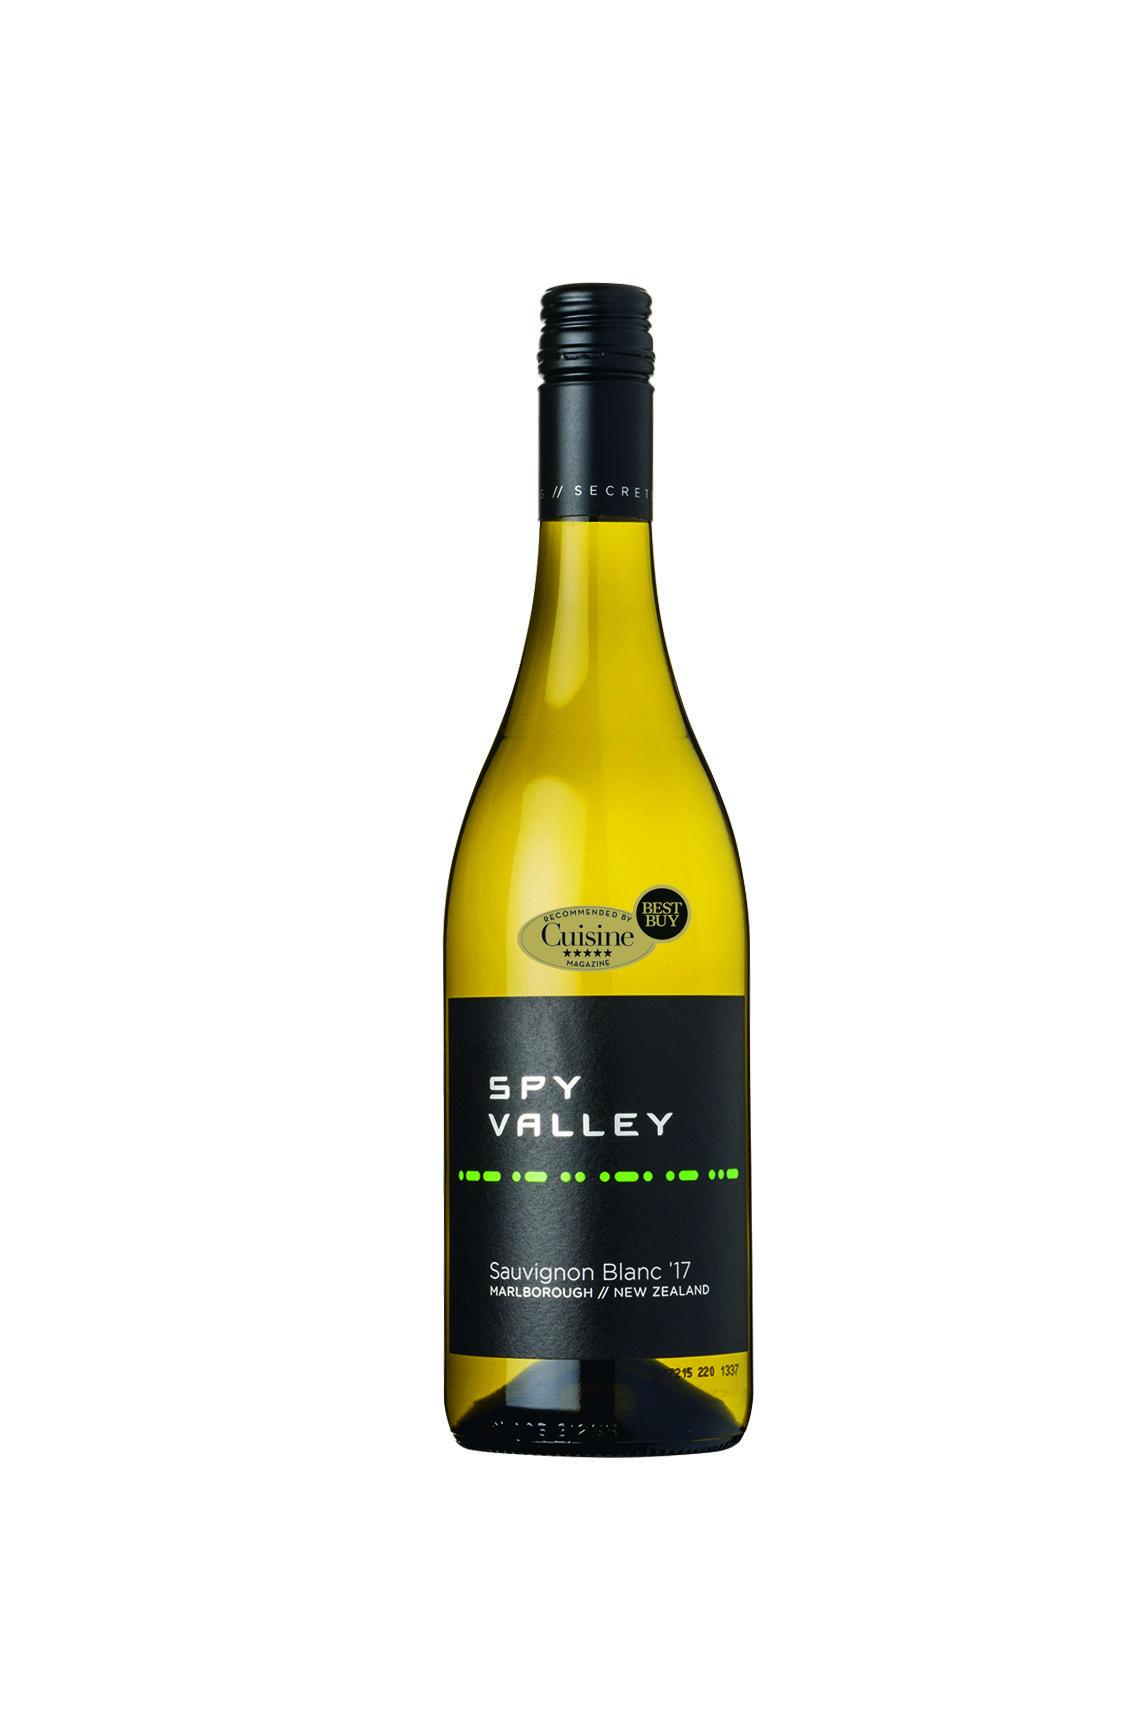 Spy Valley Sauvignon Blanc 2017